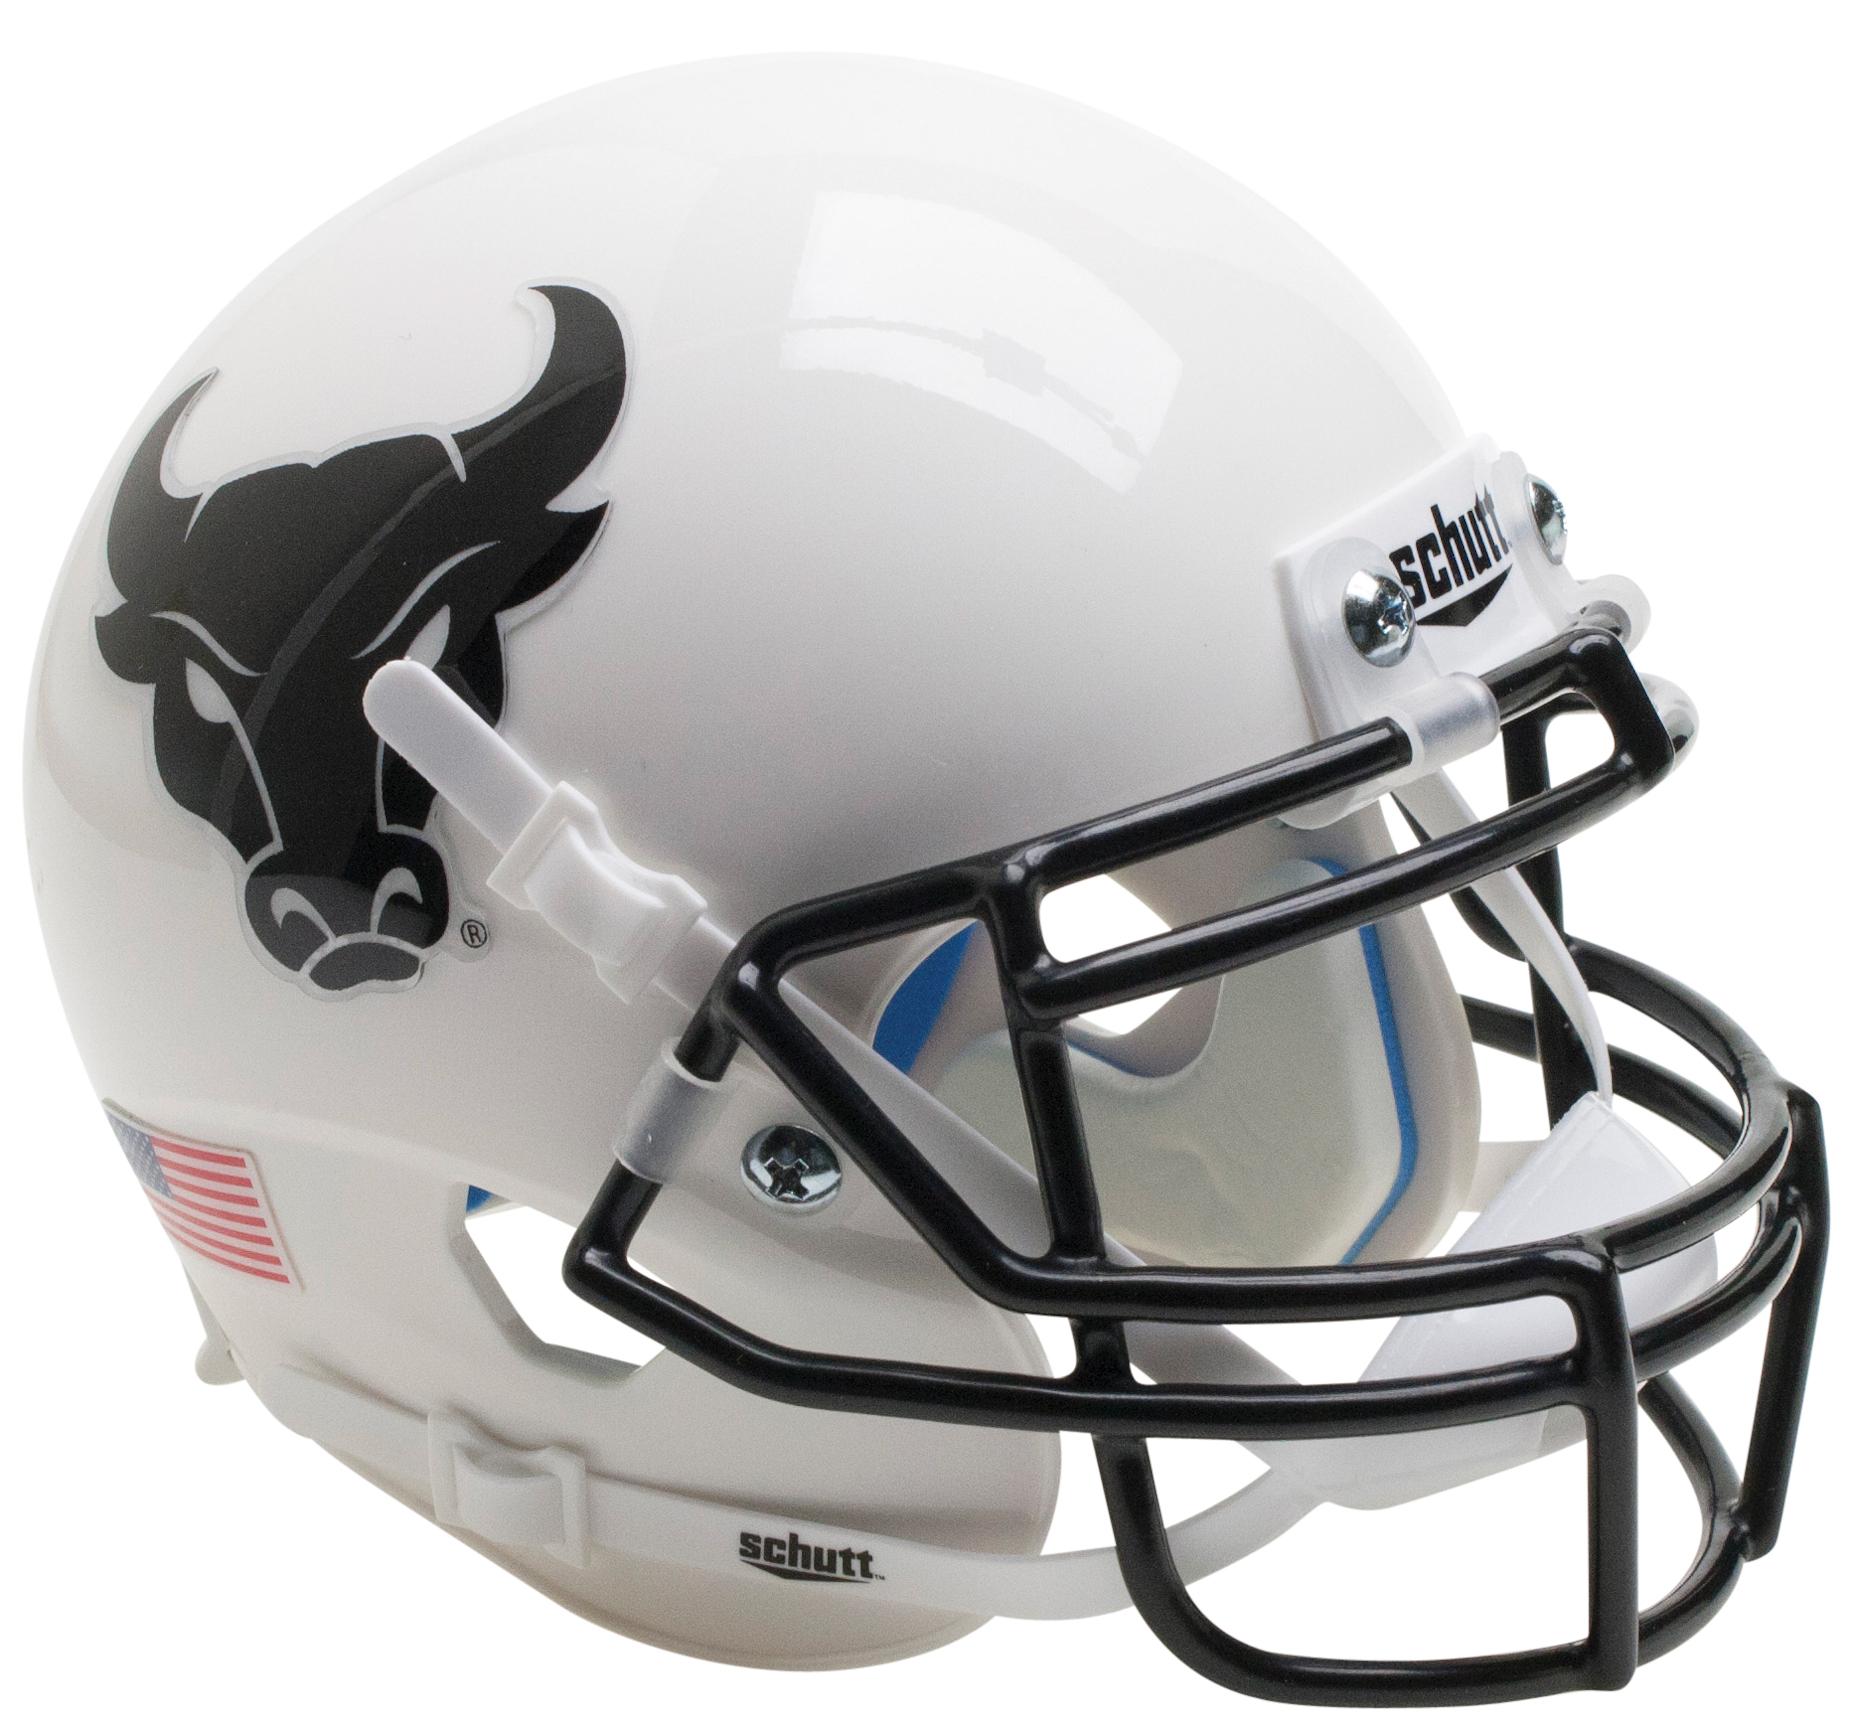 Buffalo Bulls Authentic College XP Football Helmet Schutt <B>White Black Mask</B>